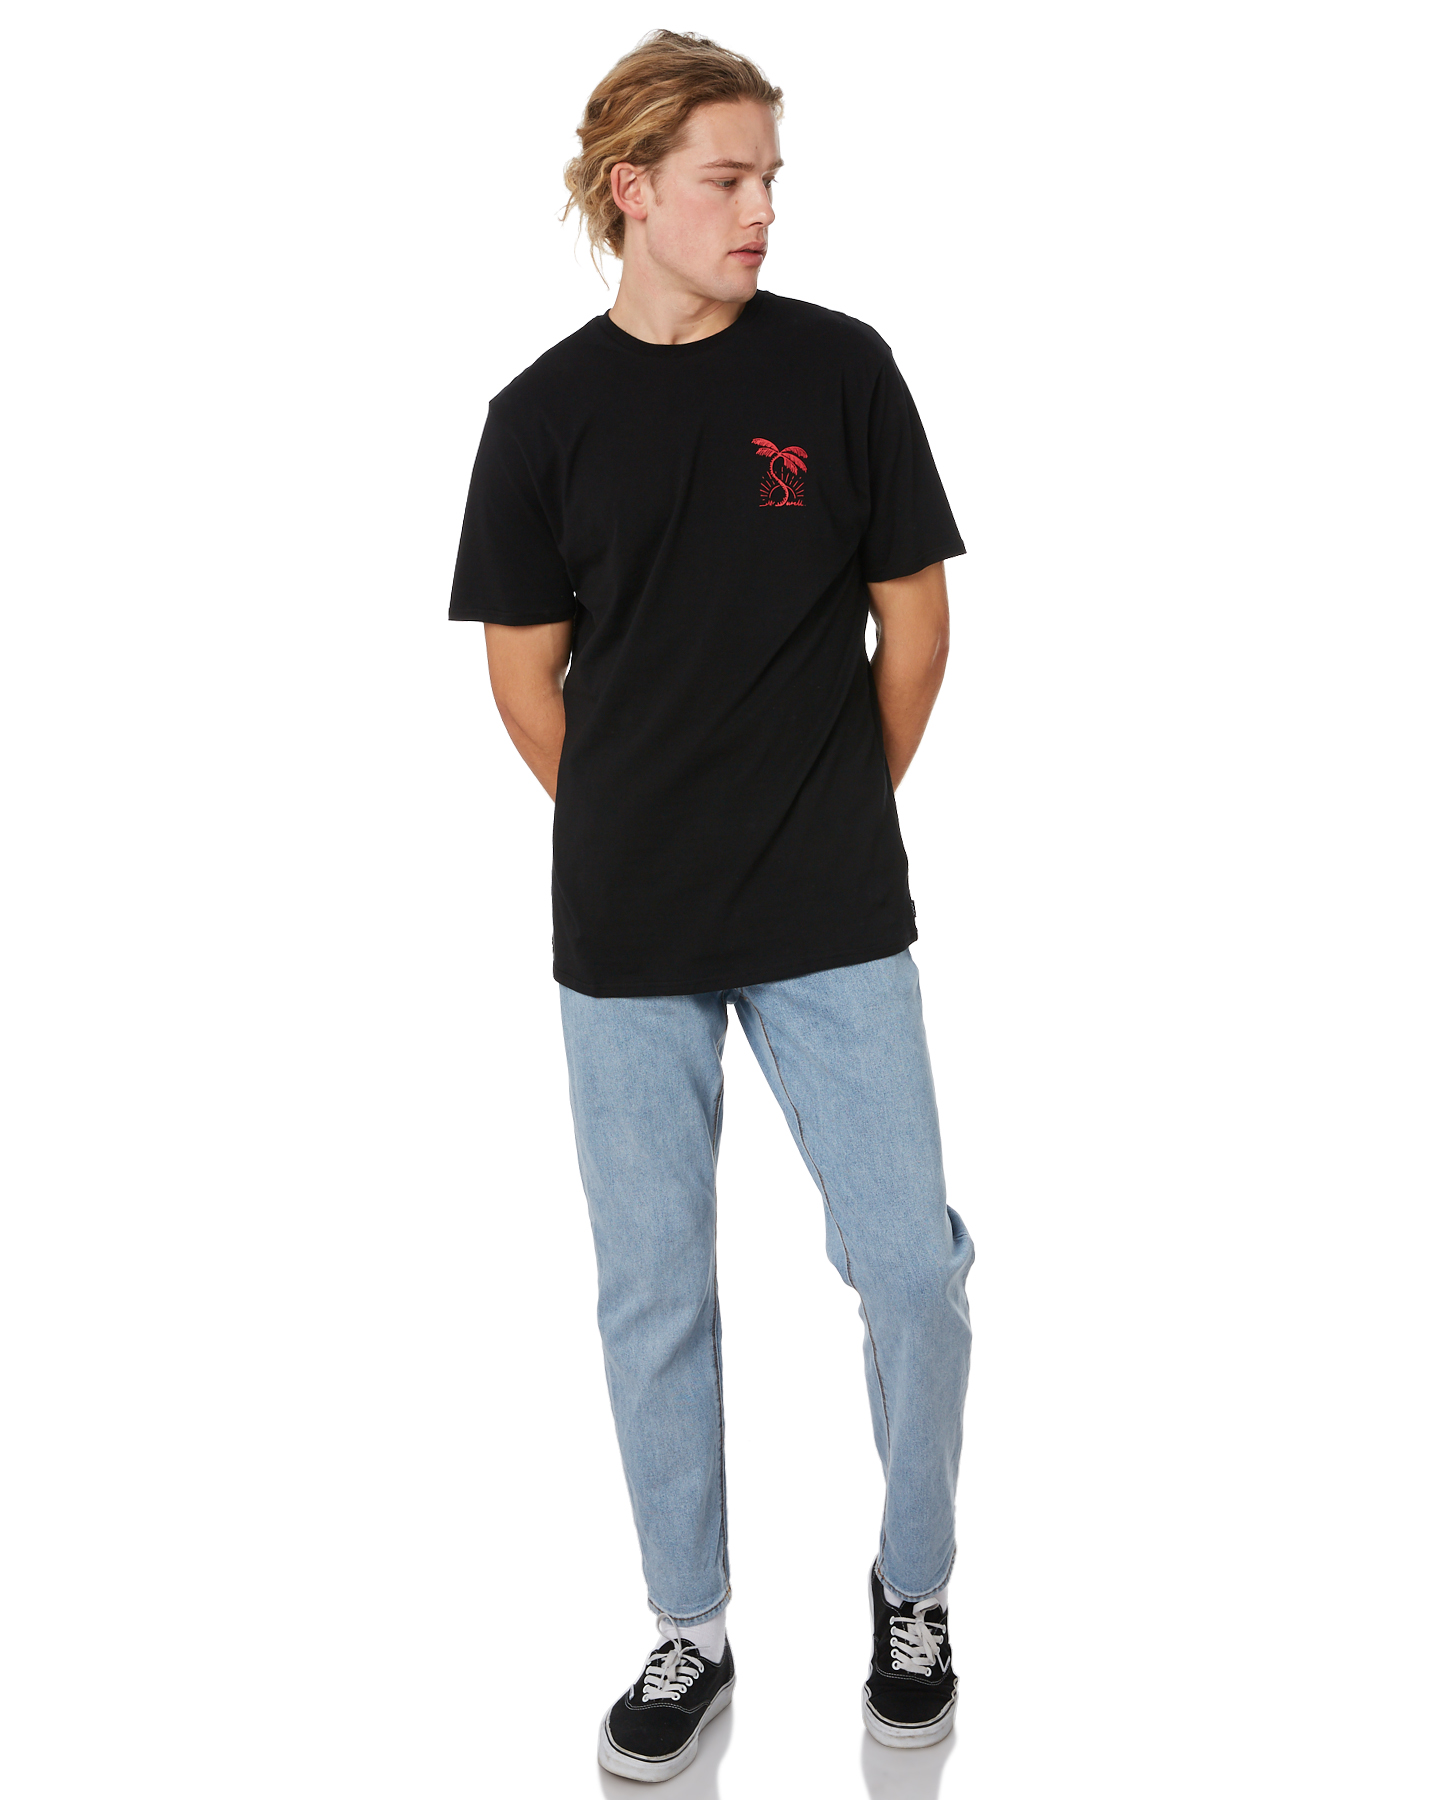 New-Swell-Men-039-s-Paradiso-Mens-Tee-Crew-Neck-Short-Sleeve-Cotton-Soft thumbnail 10